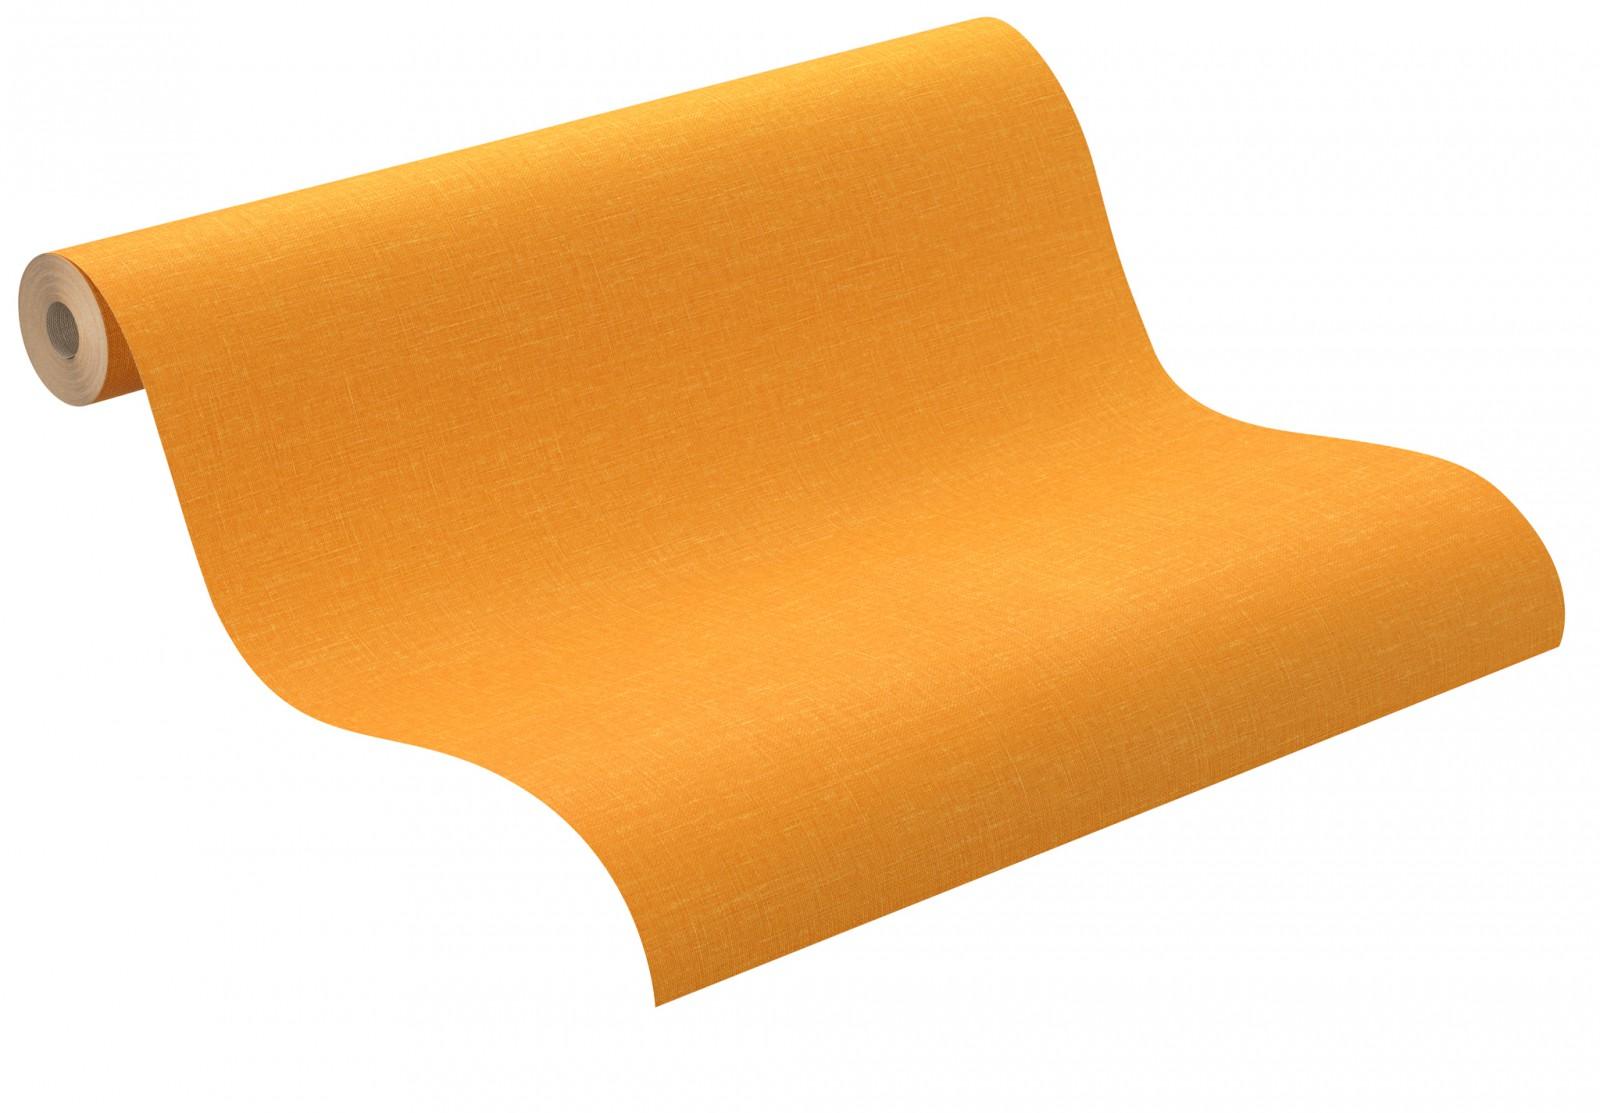 oeko tapete rasch sensual 399110 uni orange gelb. Black Bedroom Furniture Sets. Home Design Ideas